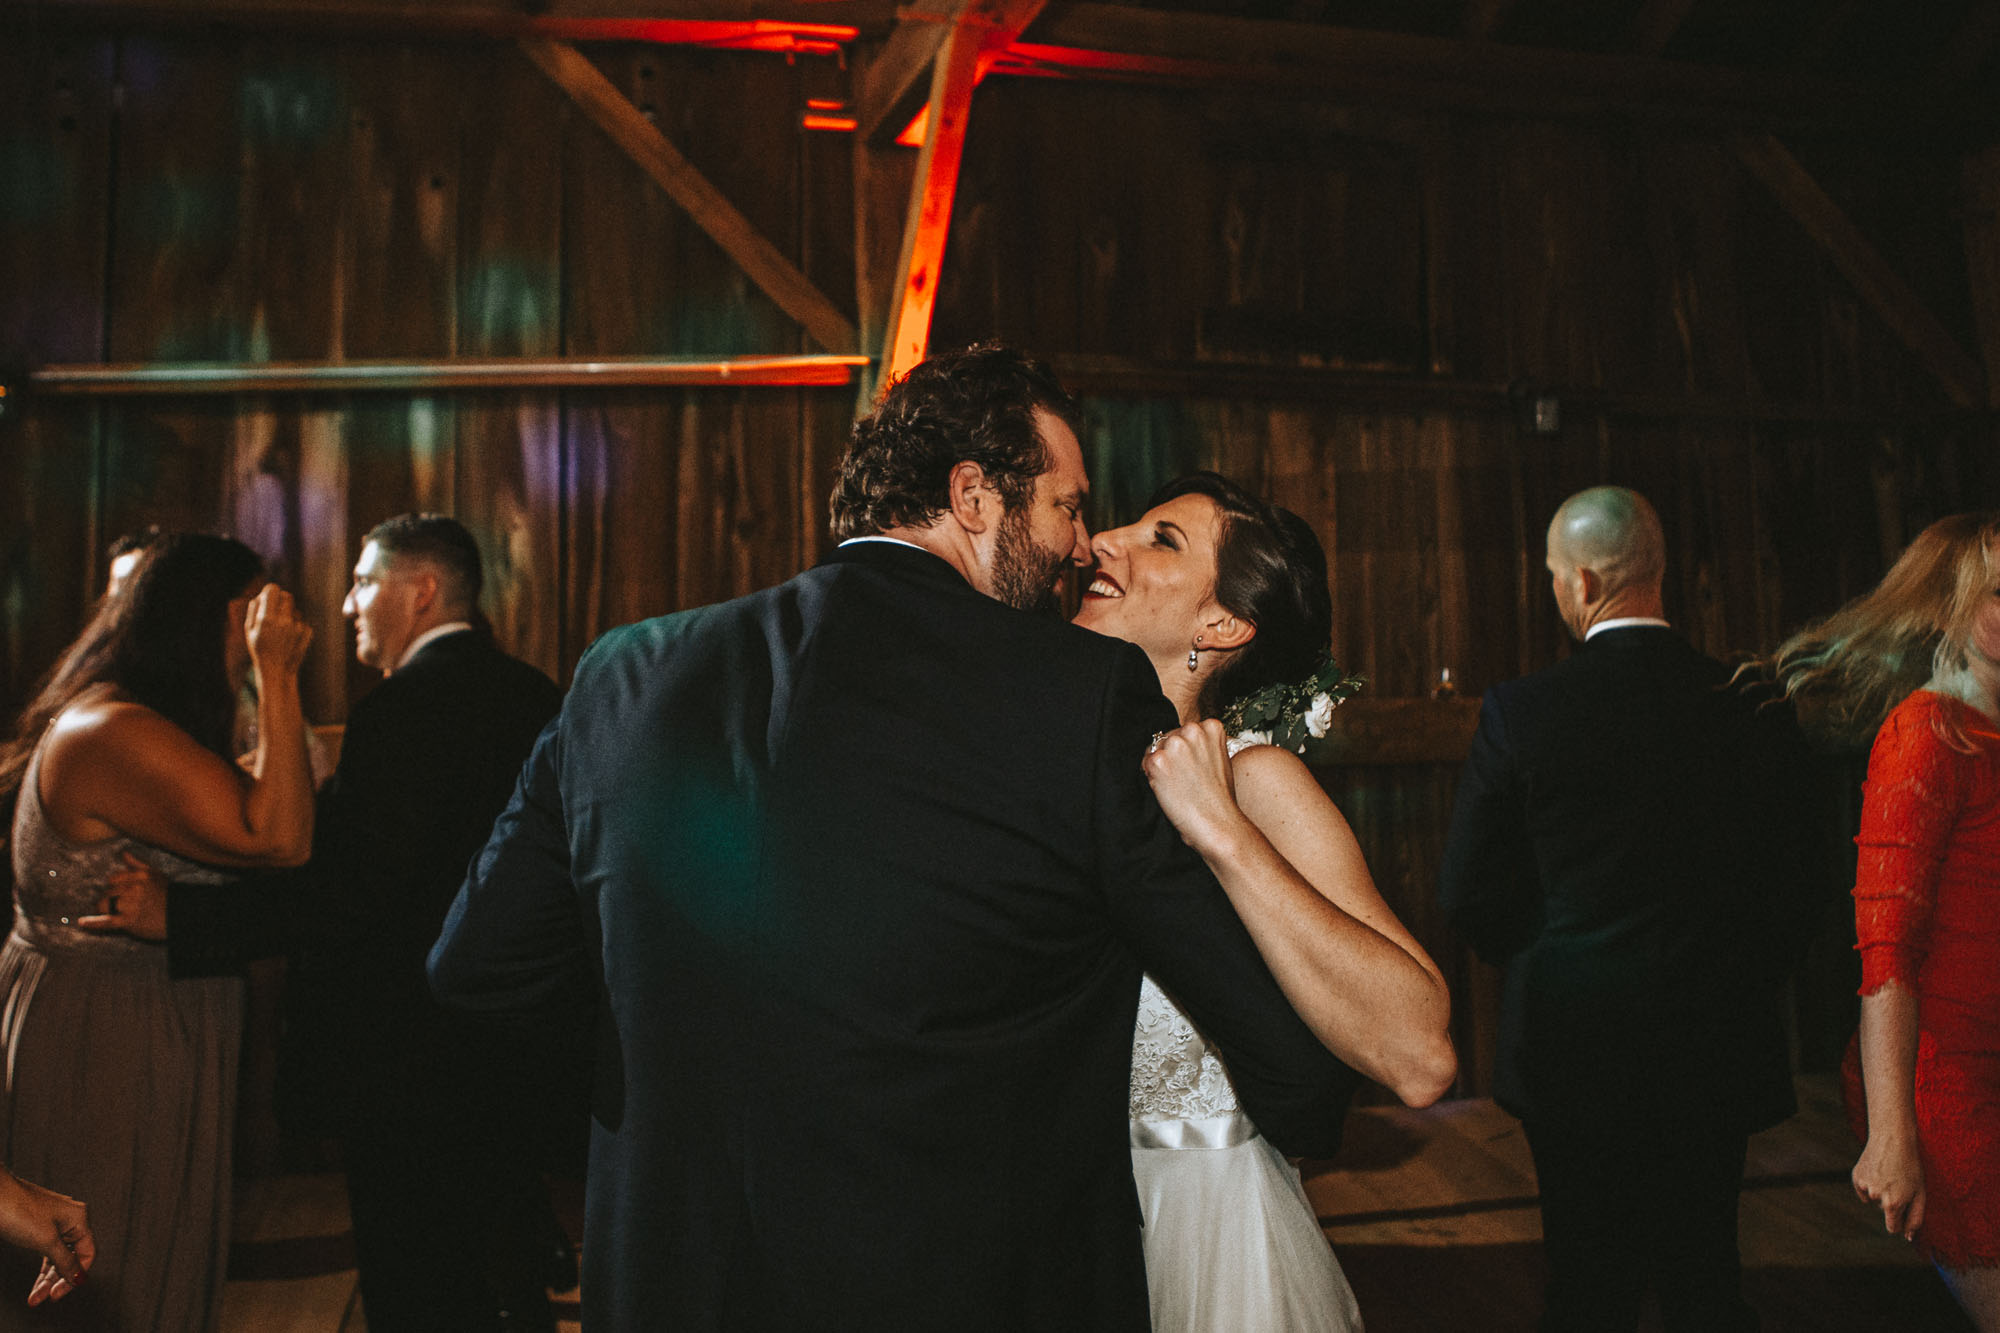 Twisted-Oaks-Studio-Arianne-Sean-Wedding-581.jpg